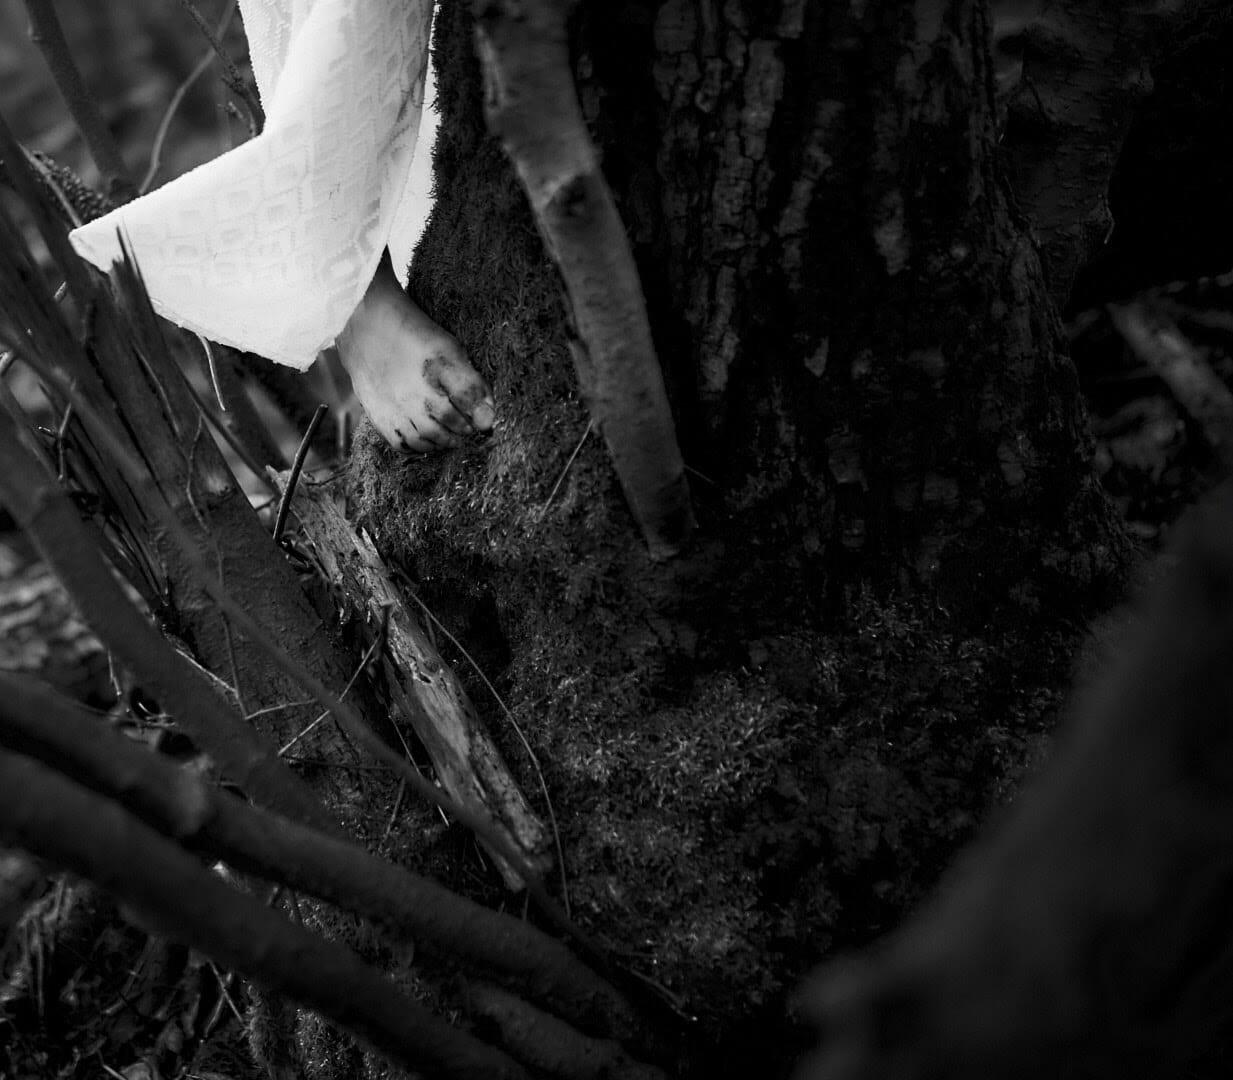 aktfotografie serie lost in the swamp 0018